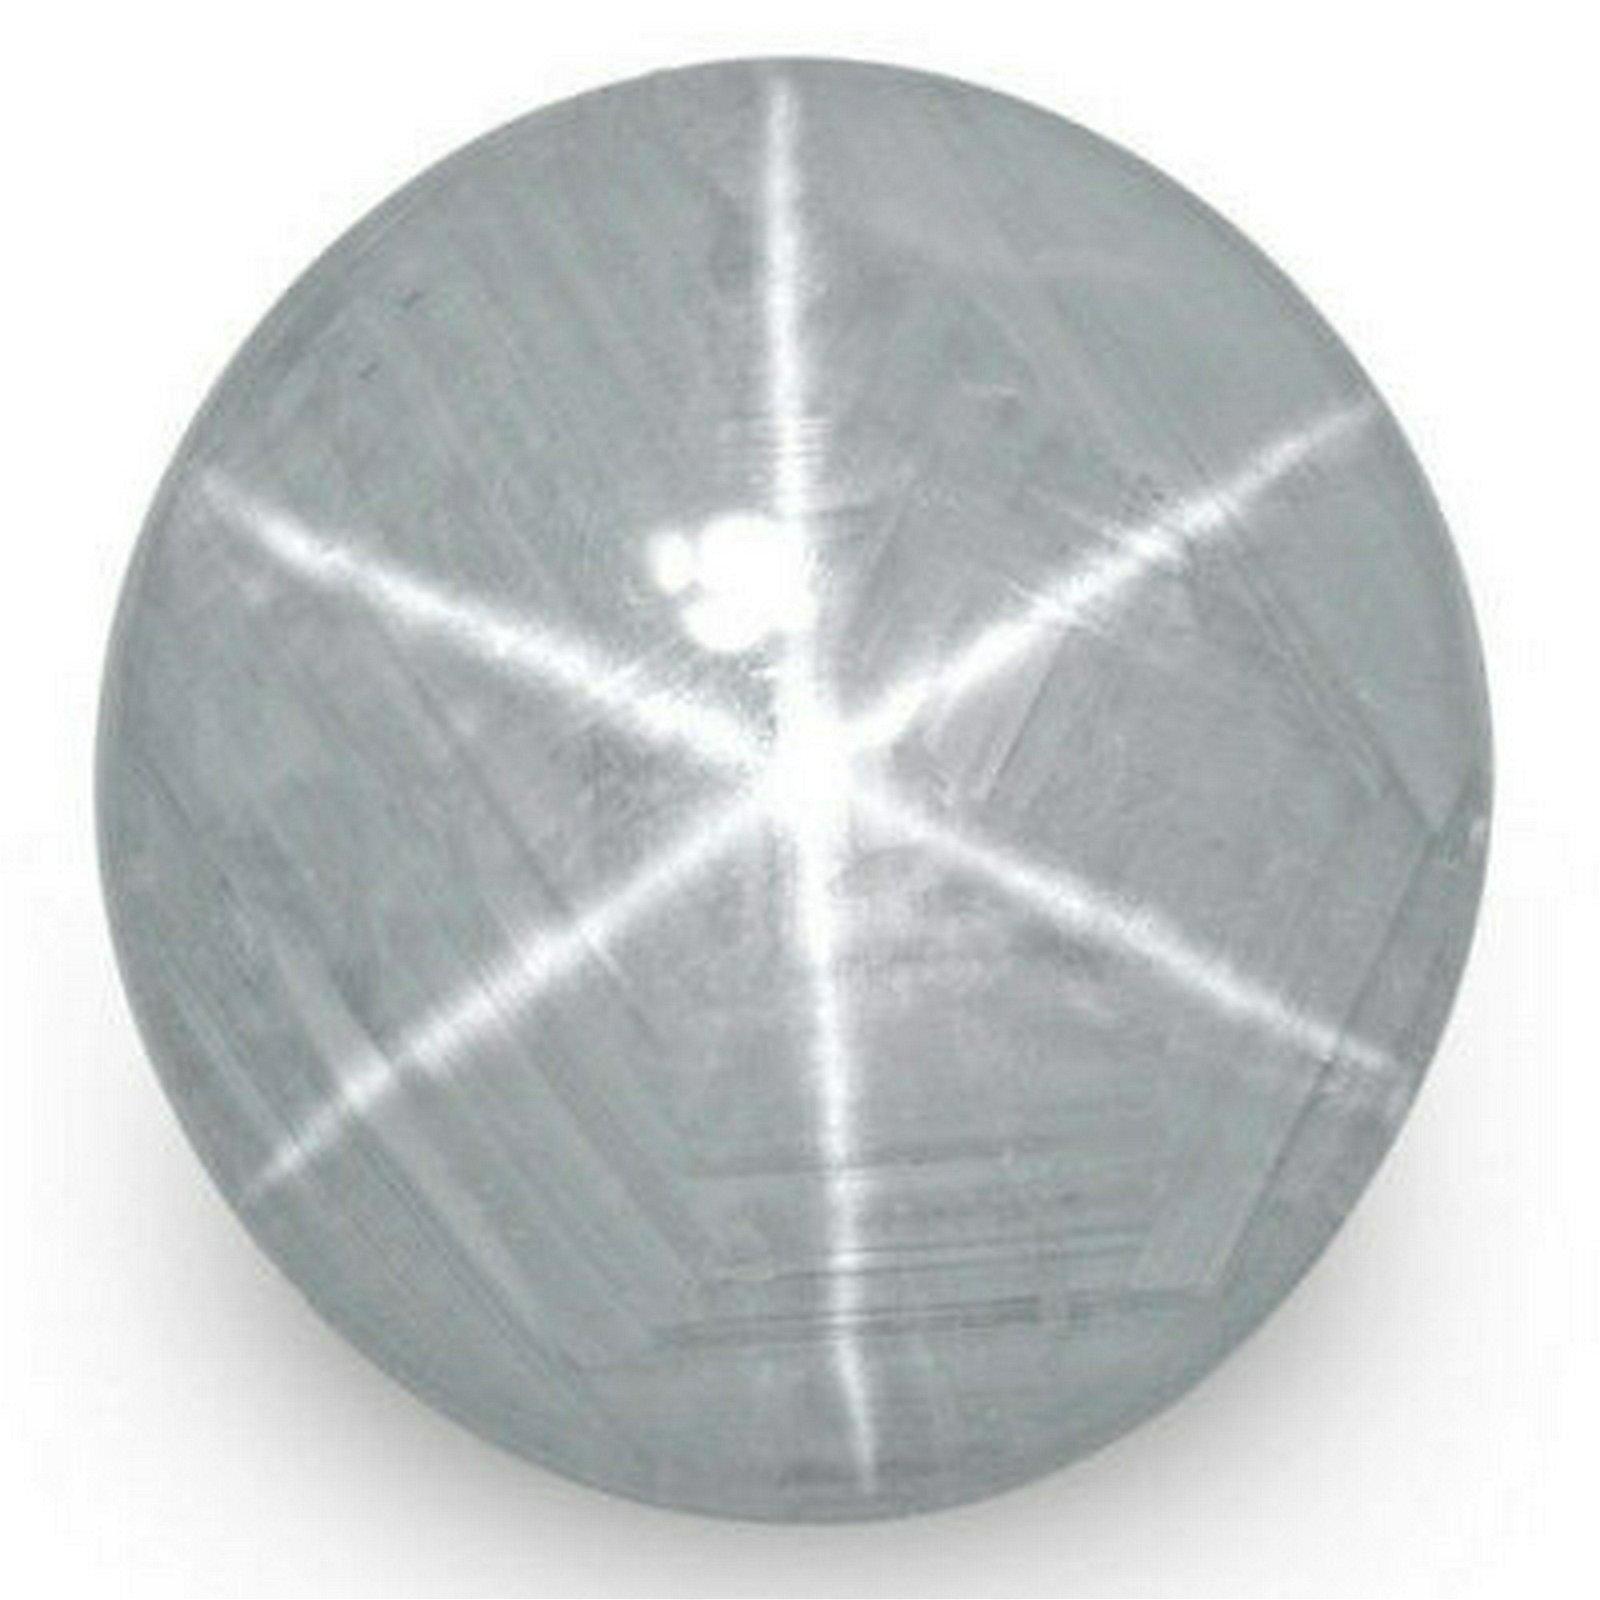 13.82-Carat Ceylon Star Sapphire with Super Sharp 6-Ray